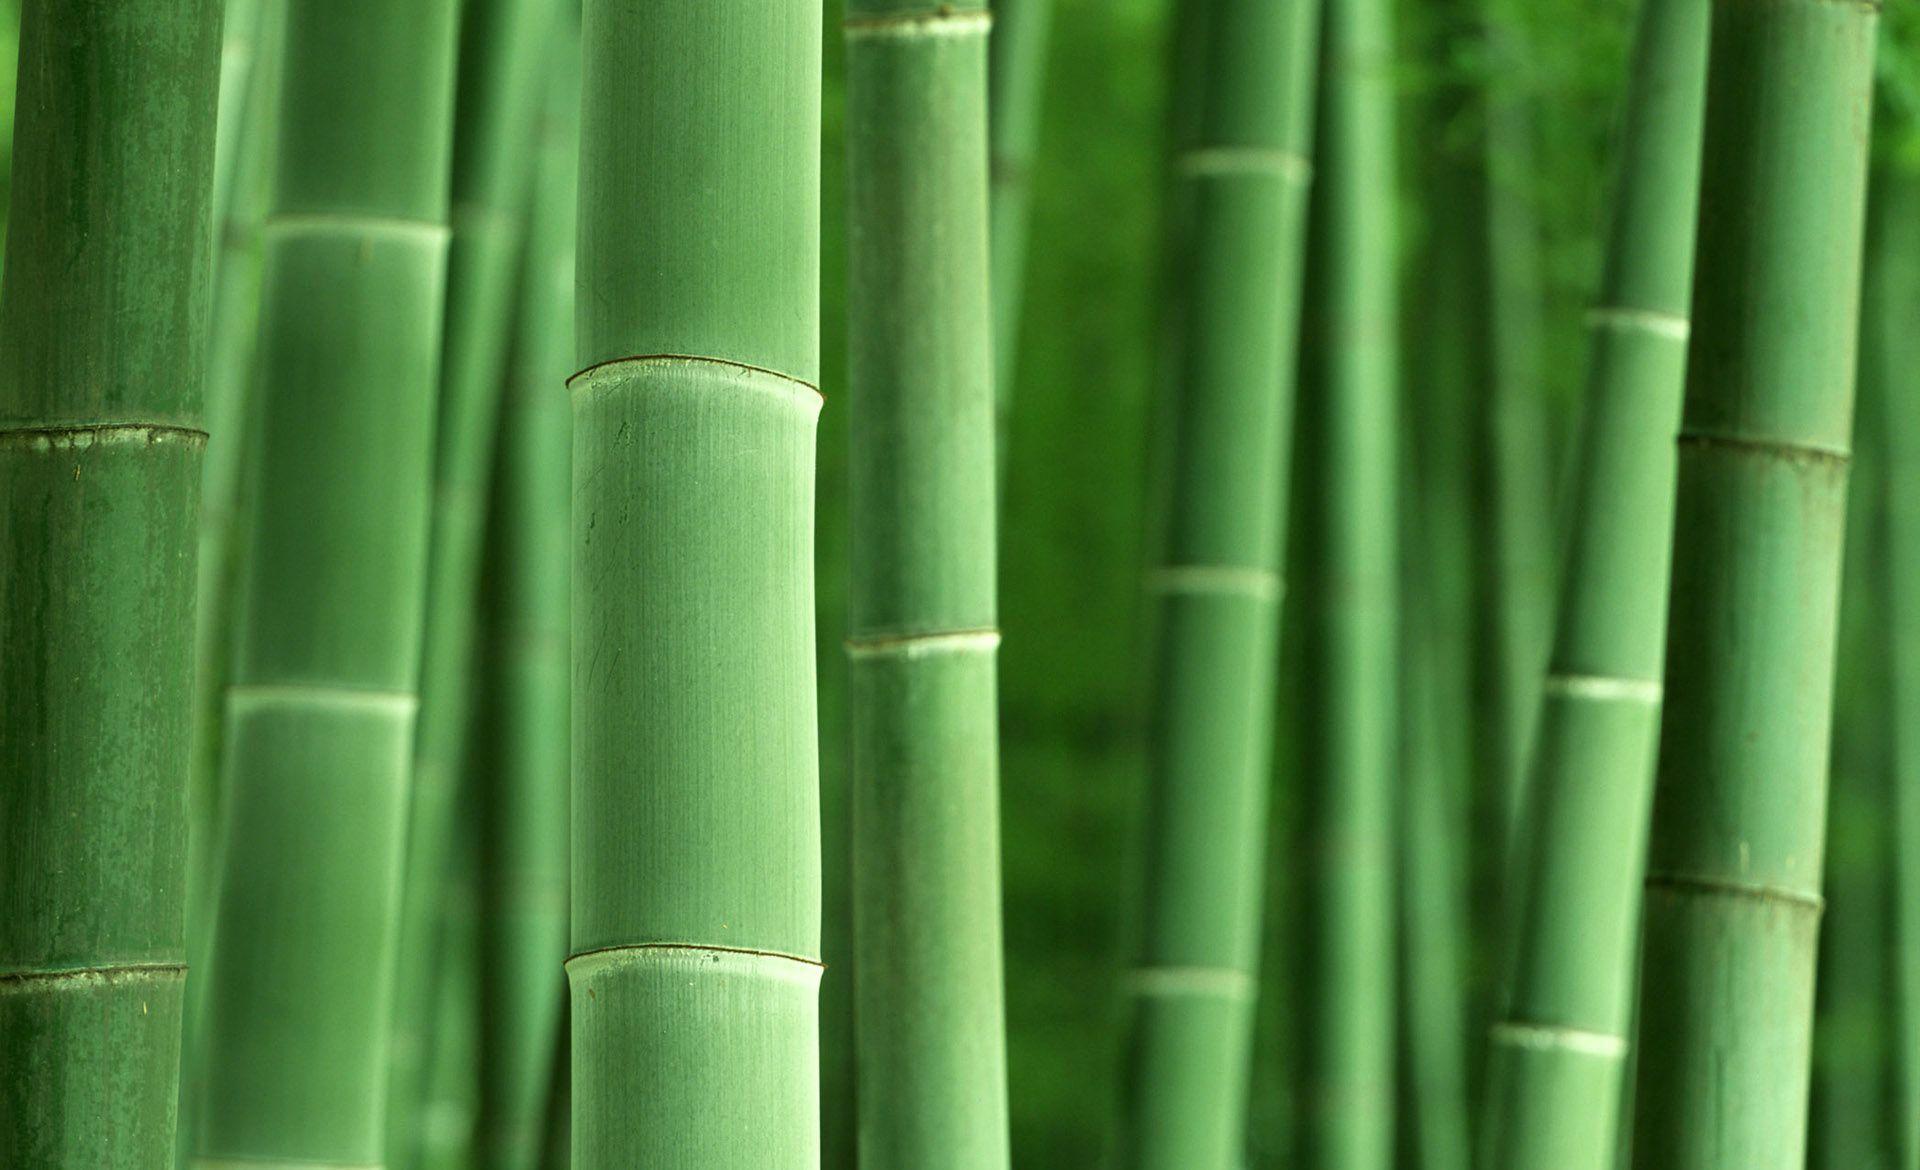 Free Hd Bamboo Wallpapers Bamboo Wallpaper Removable Wallpaper